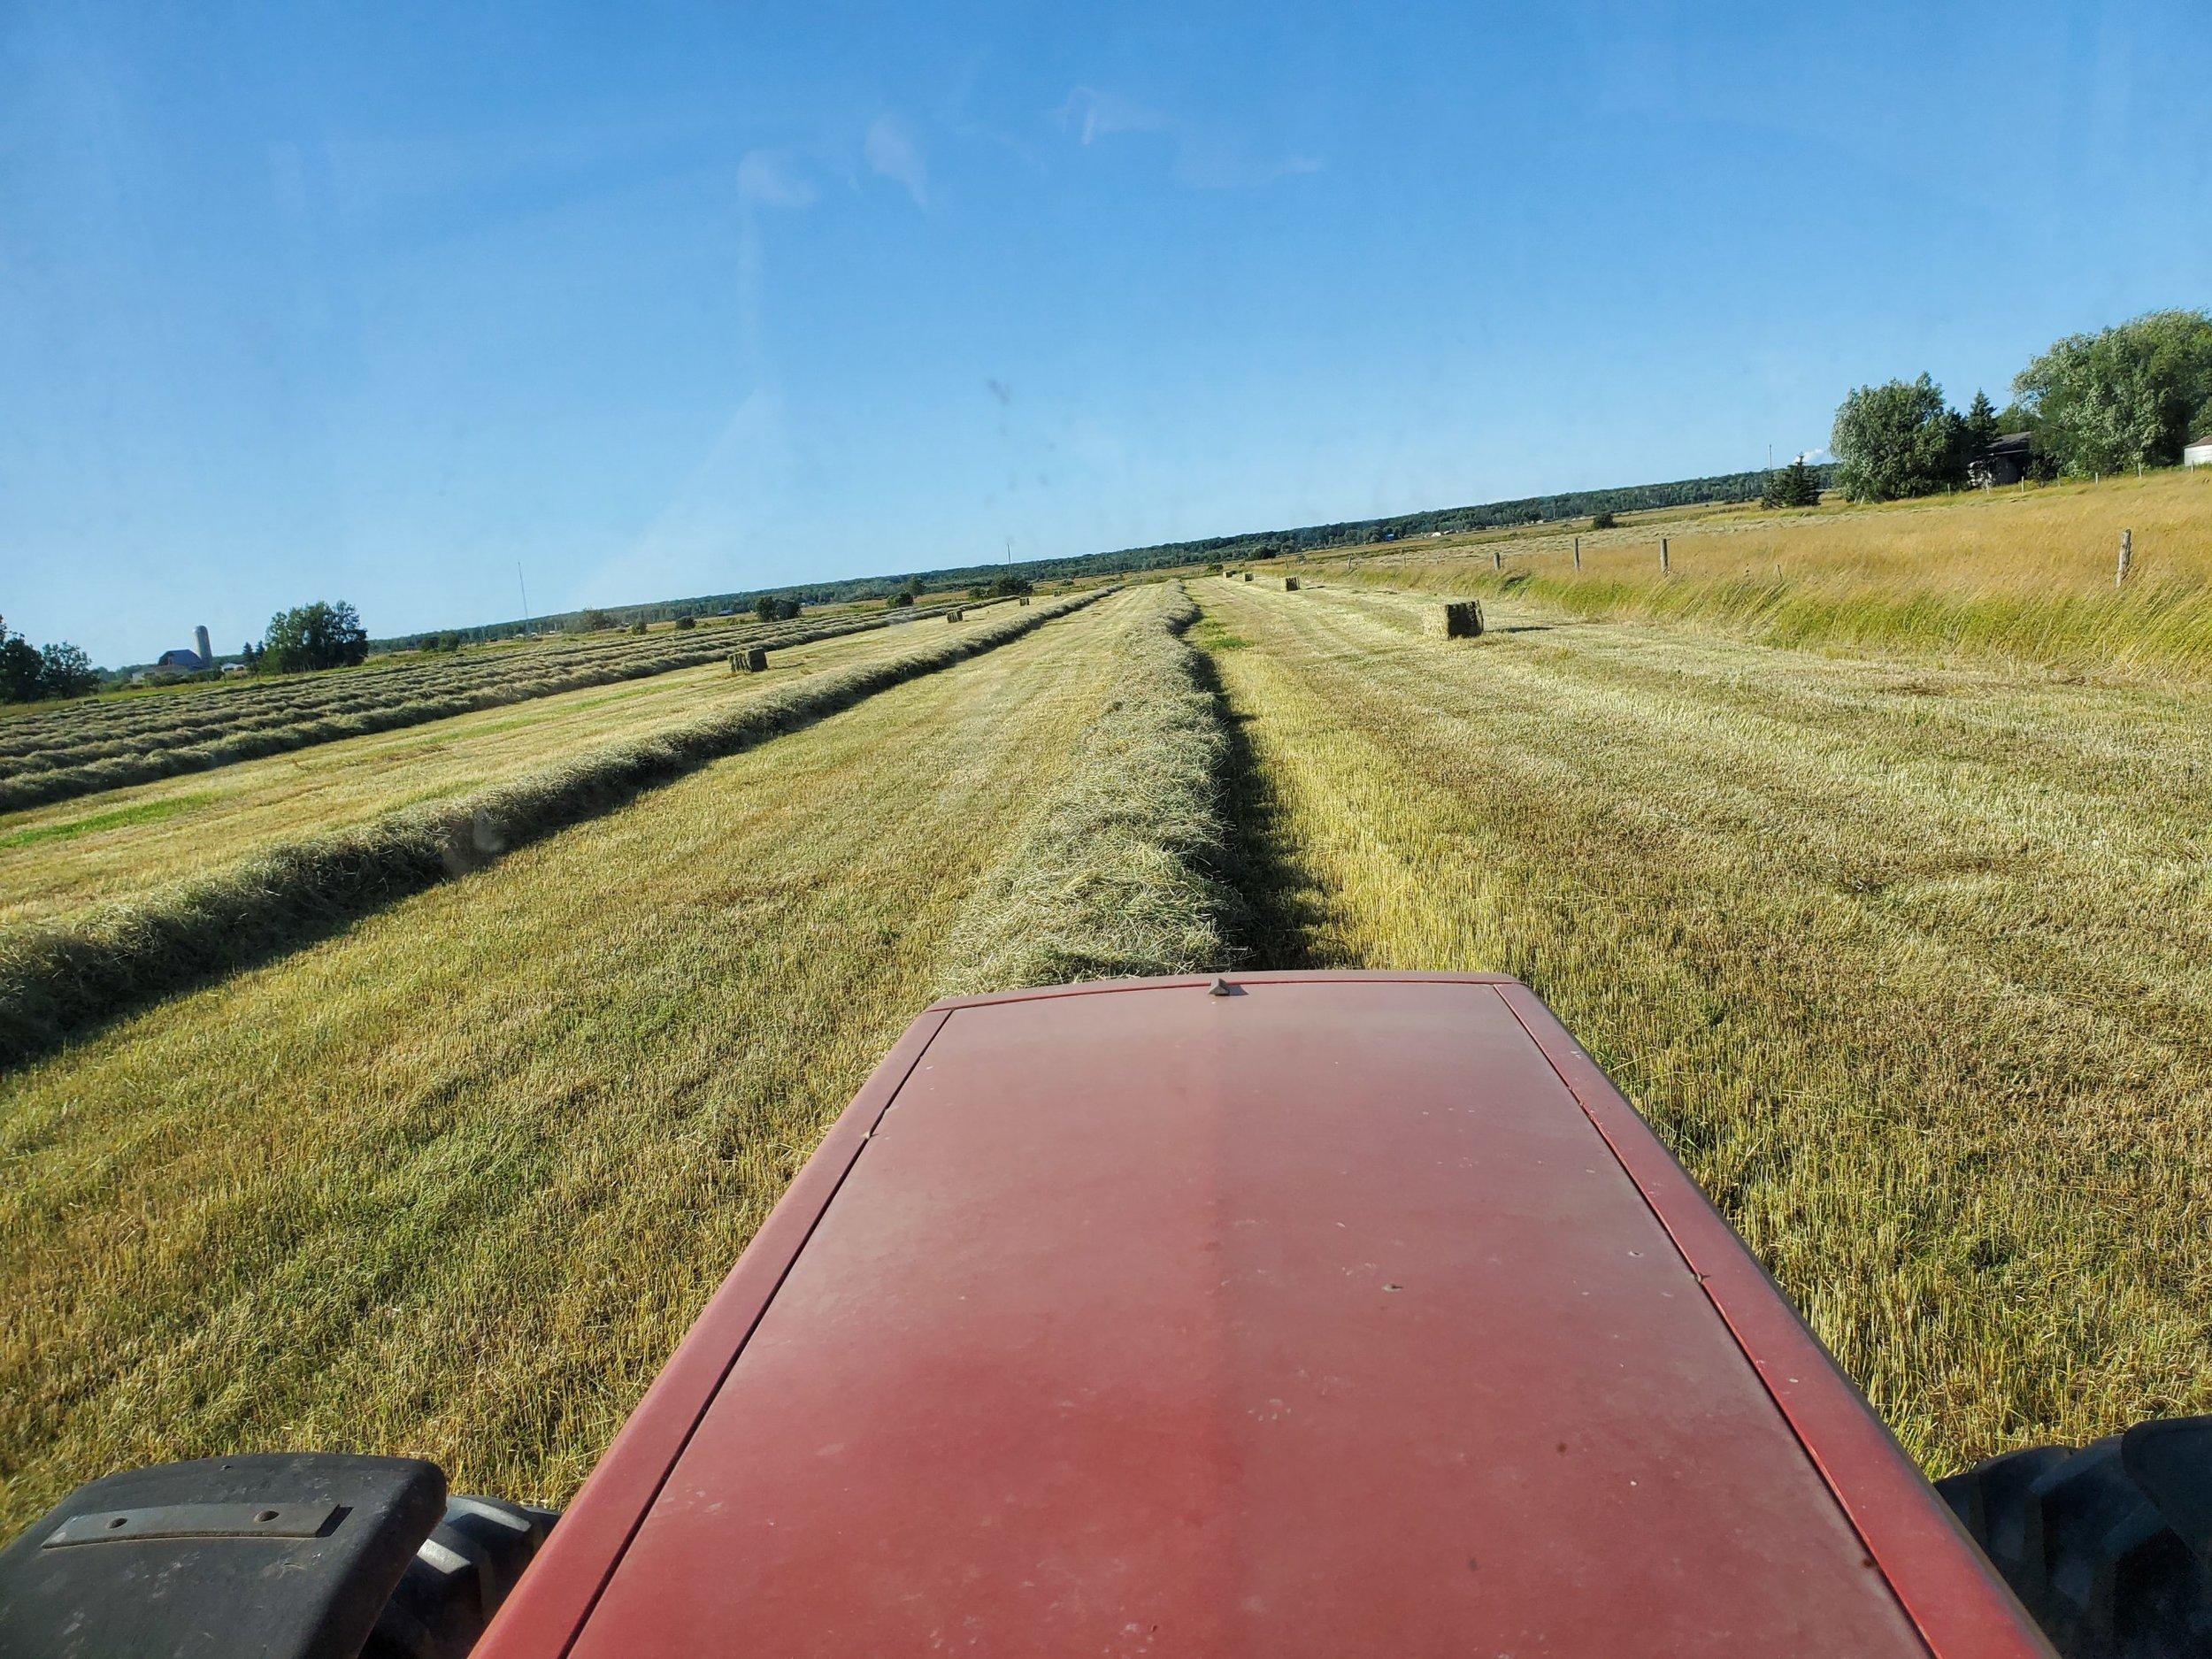 2019.8.21 - Sweeten making hay.jpg